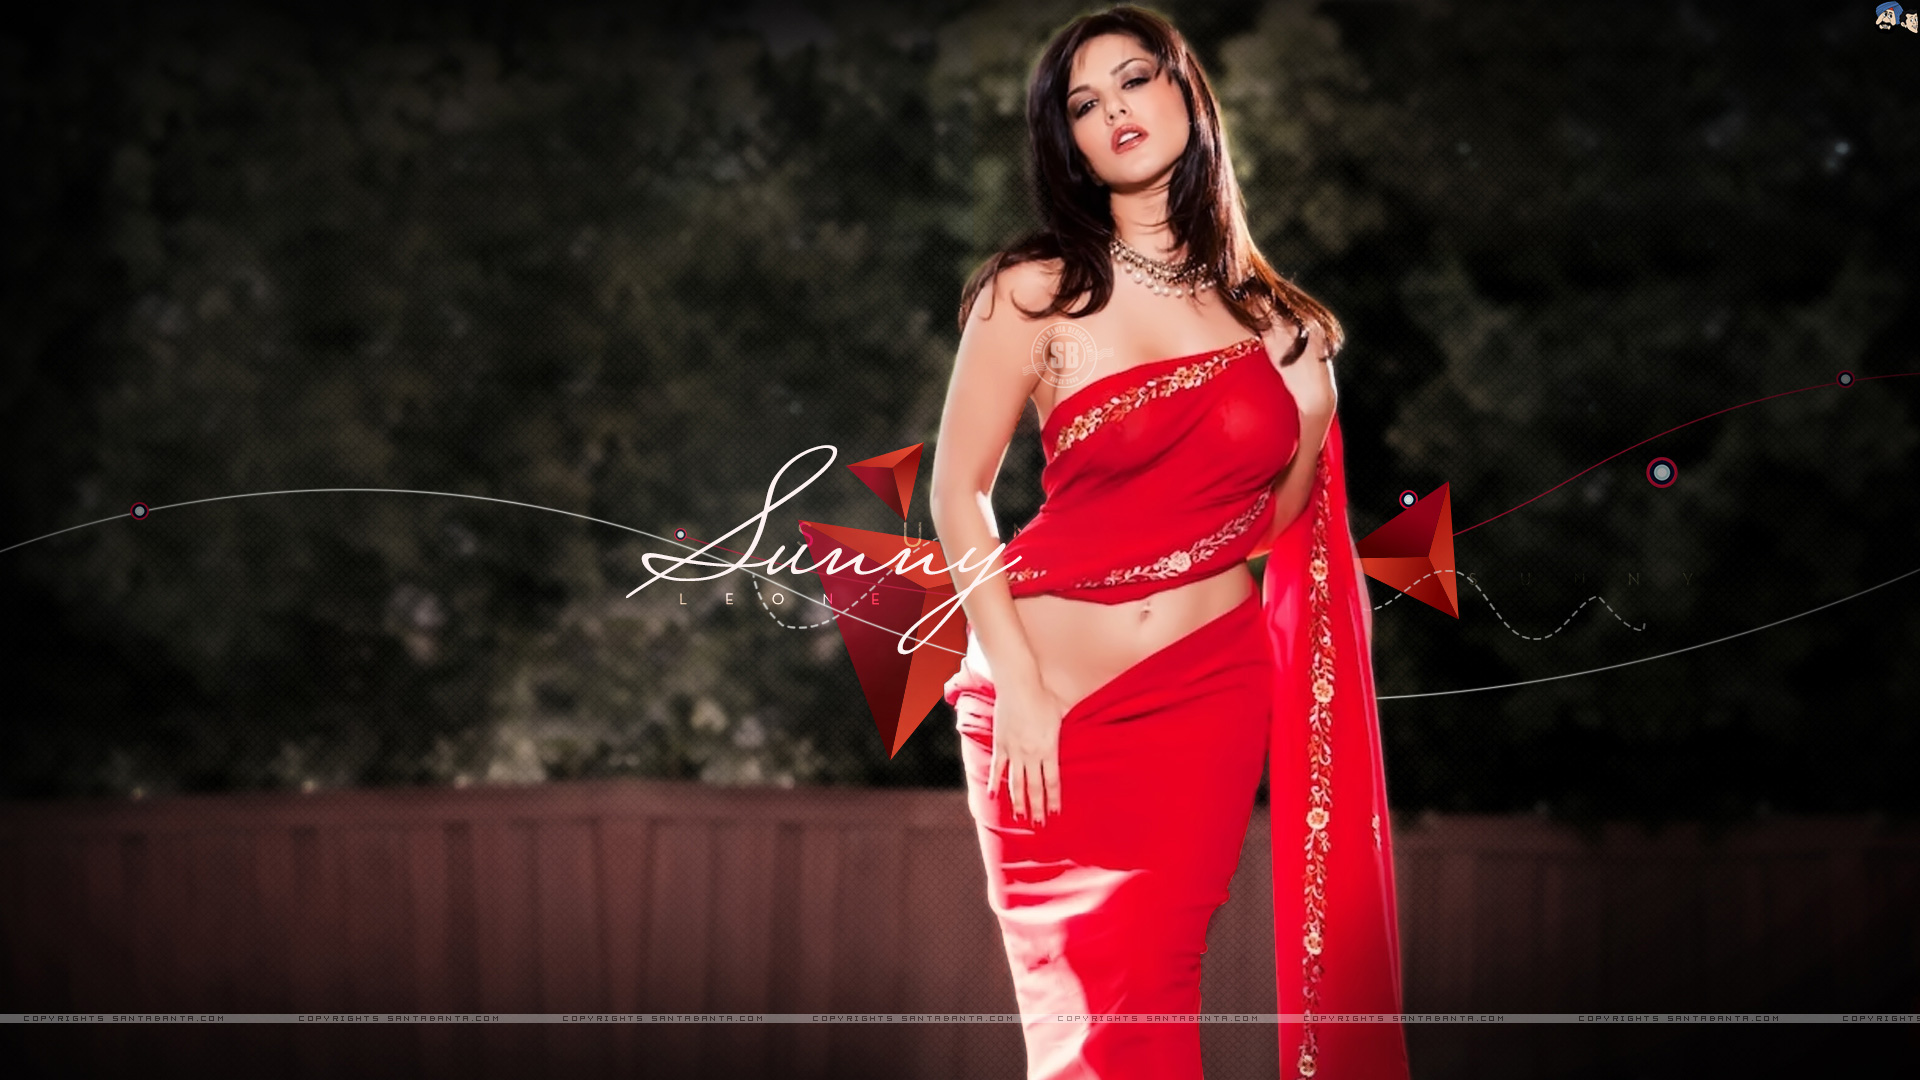 Sunny Leone Hd Wallpapers 1920x1080, Sunny Leone HD High Quality